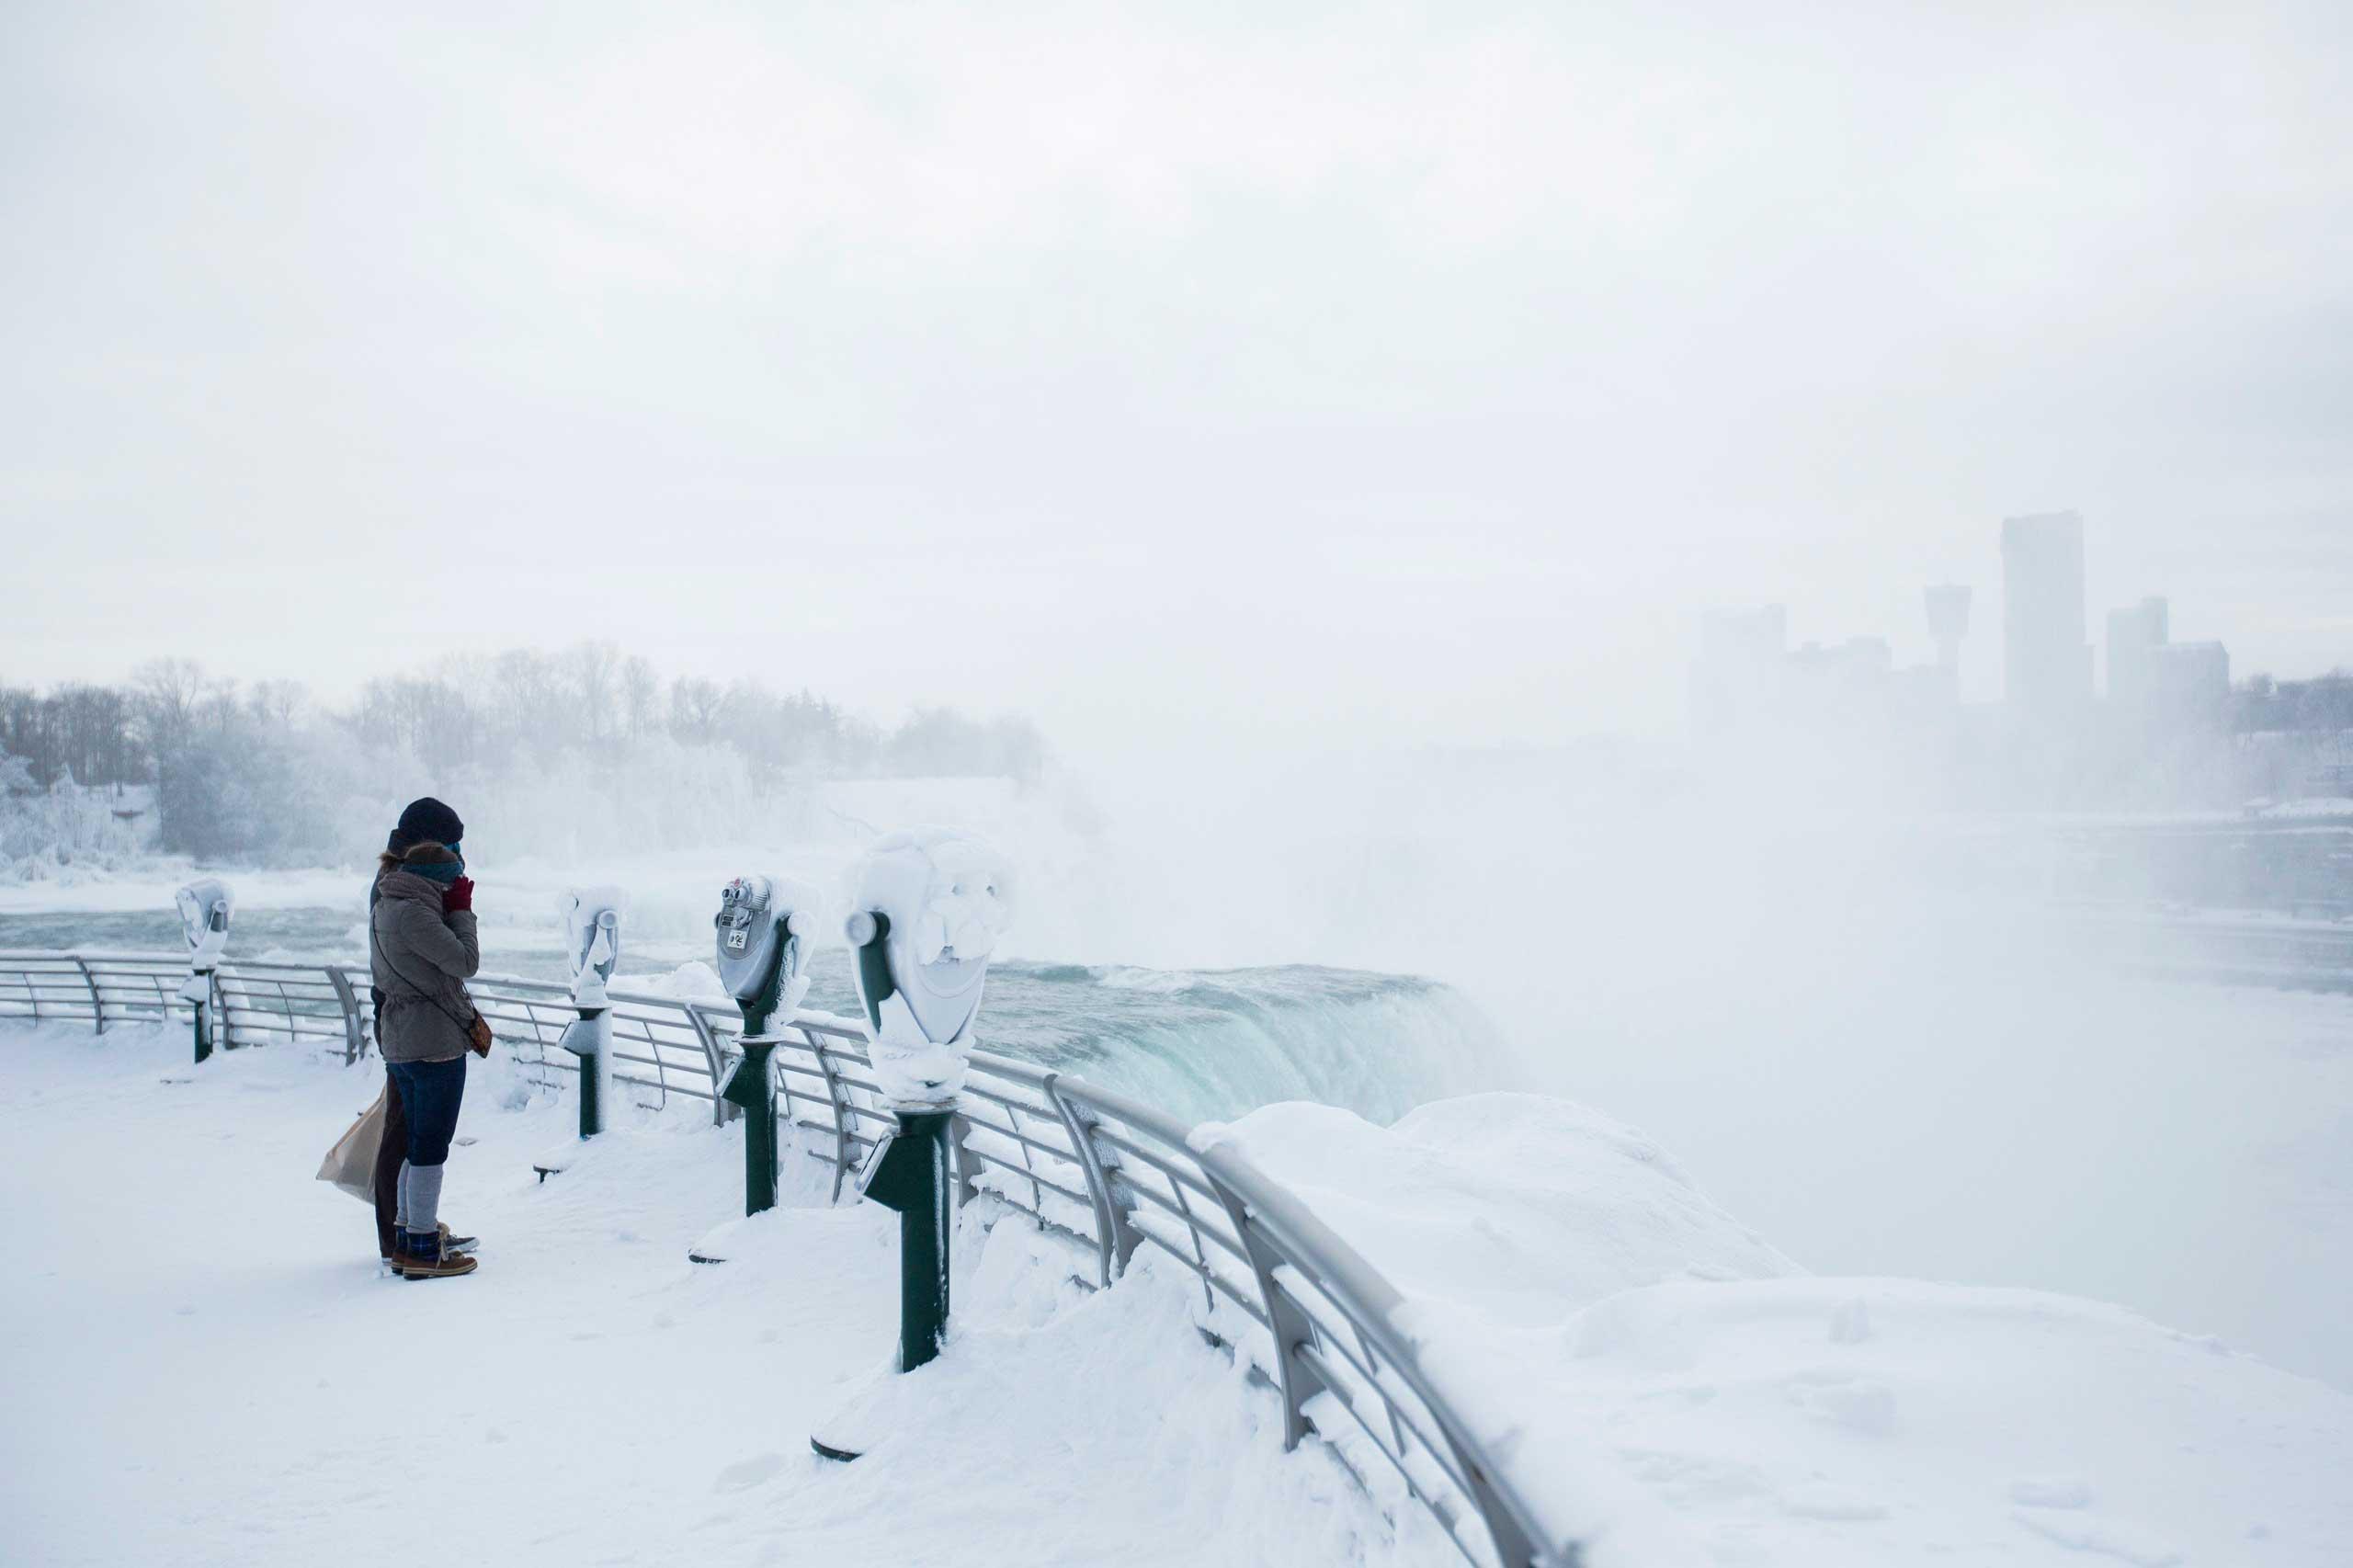 Visitors view frozen Niagara Falls in Niagara Falls, N.Y., Feb. 17, 2015.